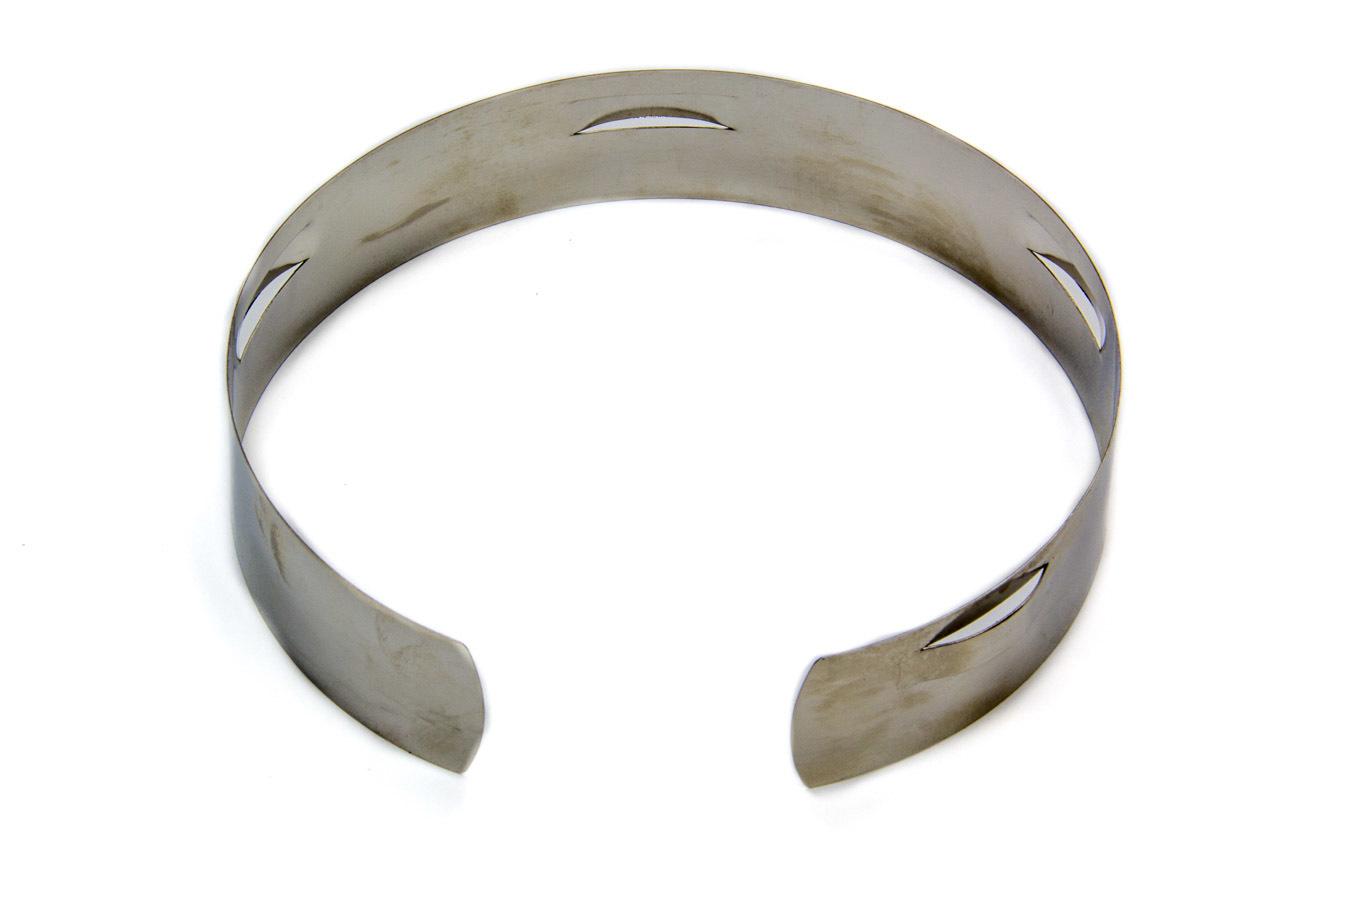 Proform Piston Ring Squaring Tool